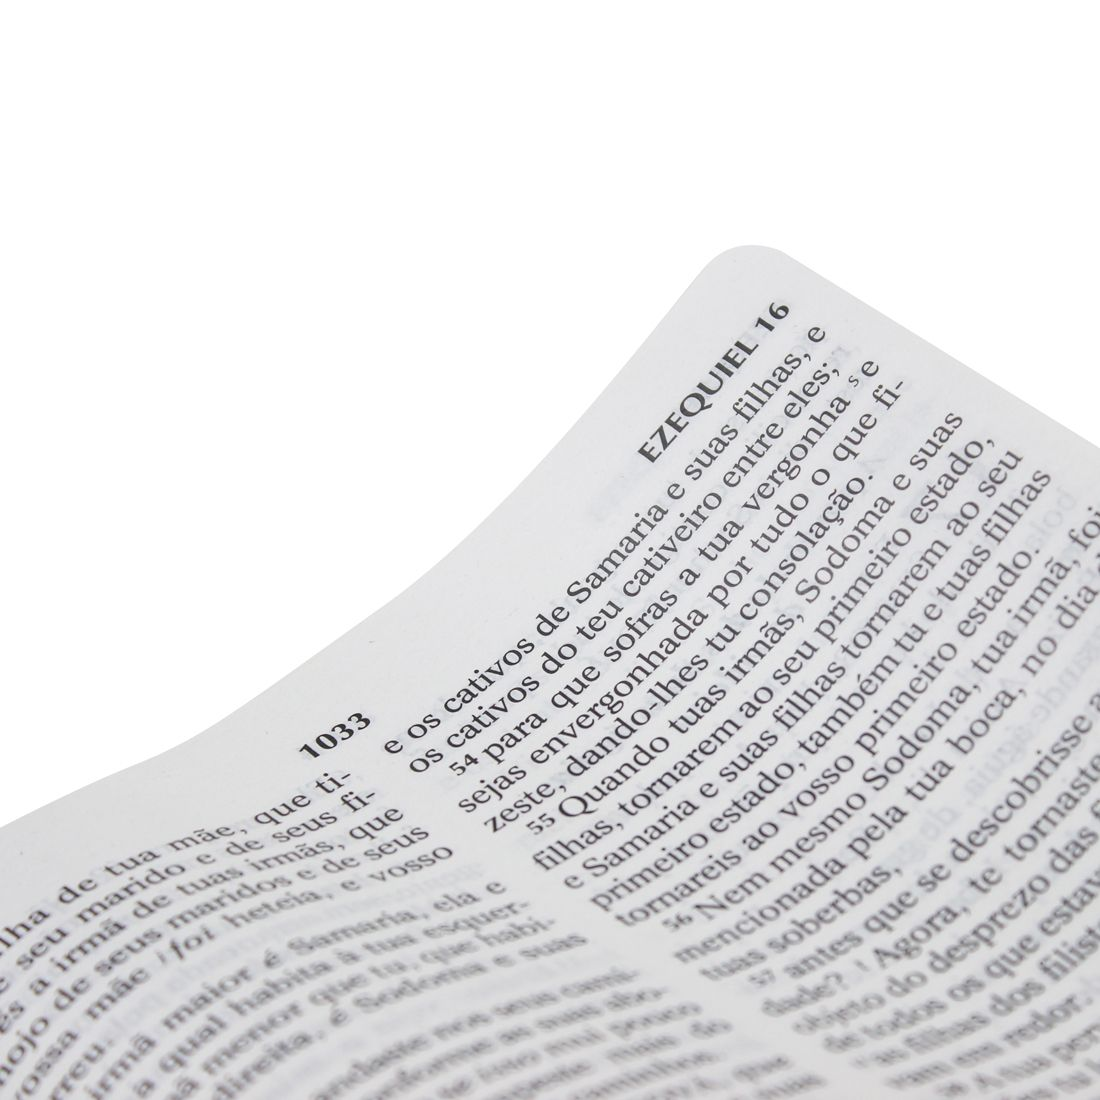 Bíblia Sagrada Letra Gigante com Harpa Cristã - Semiflex Tradicional Preta